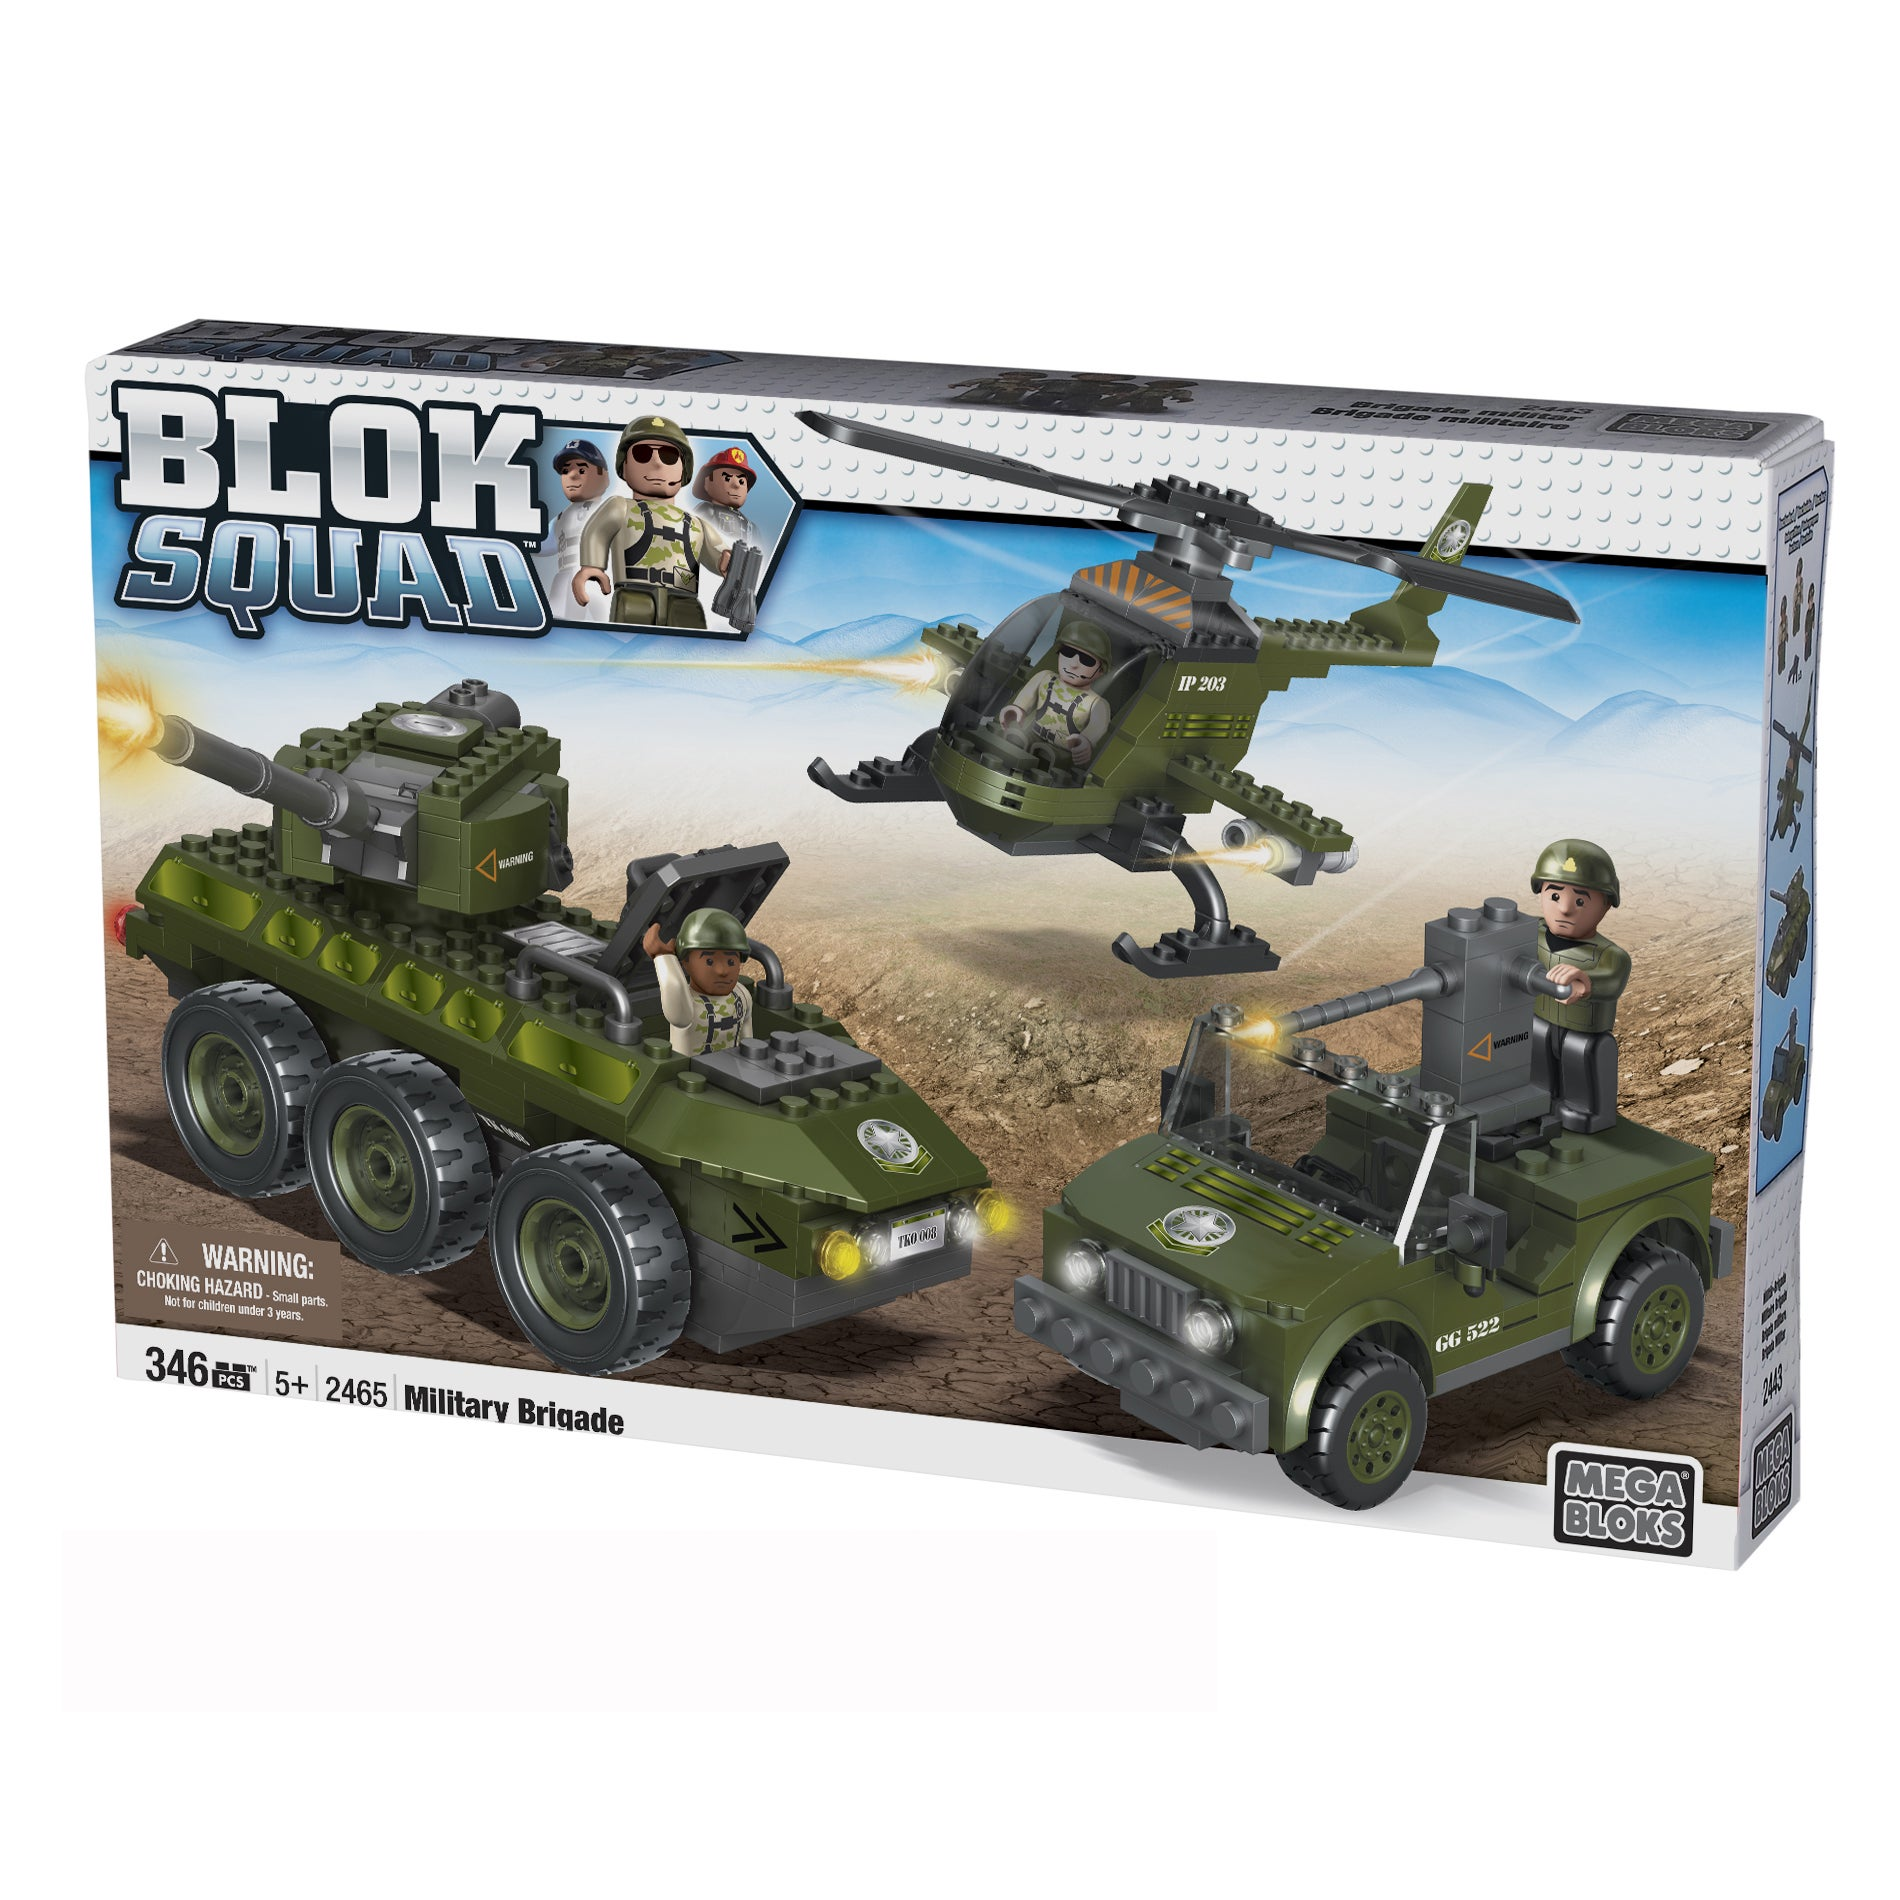 Mega Bloks Blok Squad Ultimate Army Military Brigade